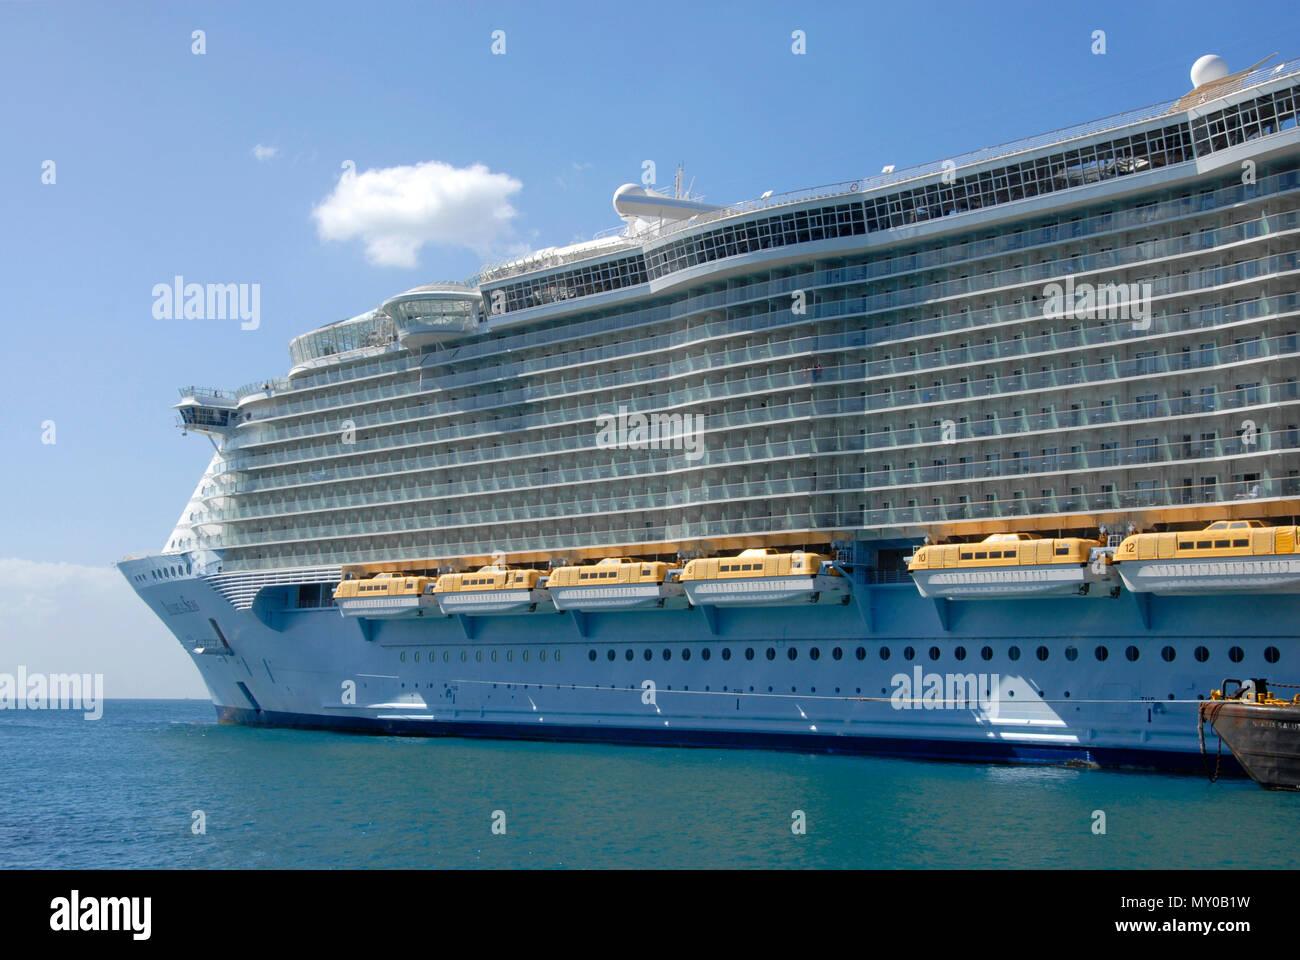 Large cruise ship moored at Philipsburg, St Maarten, Caribbean - Stock Image